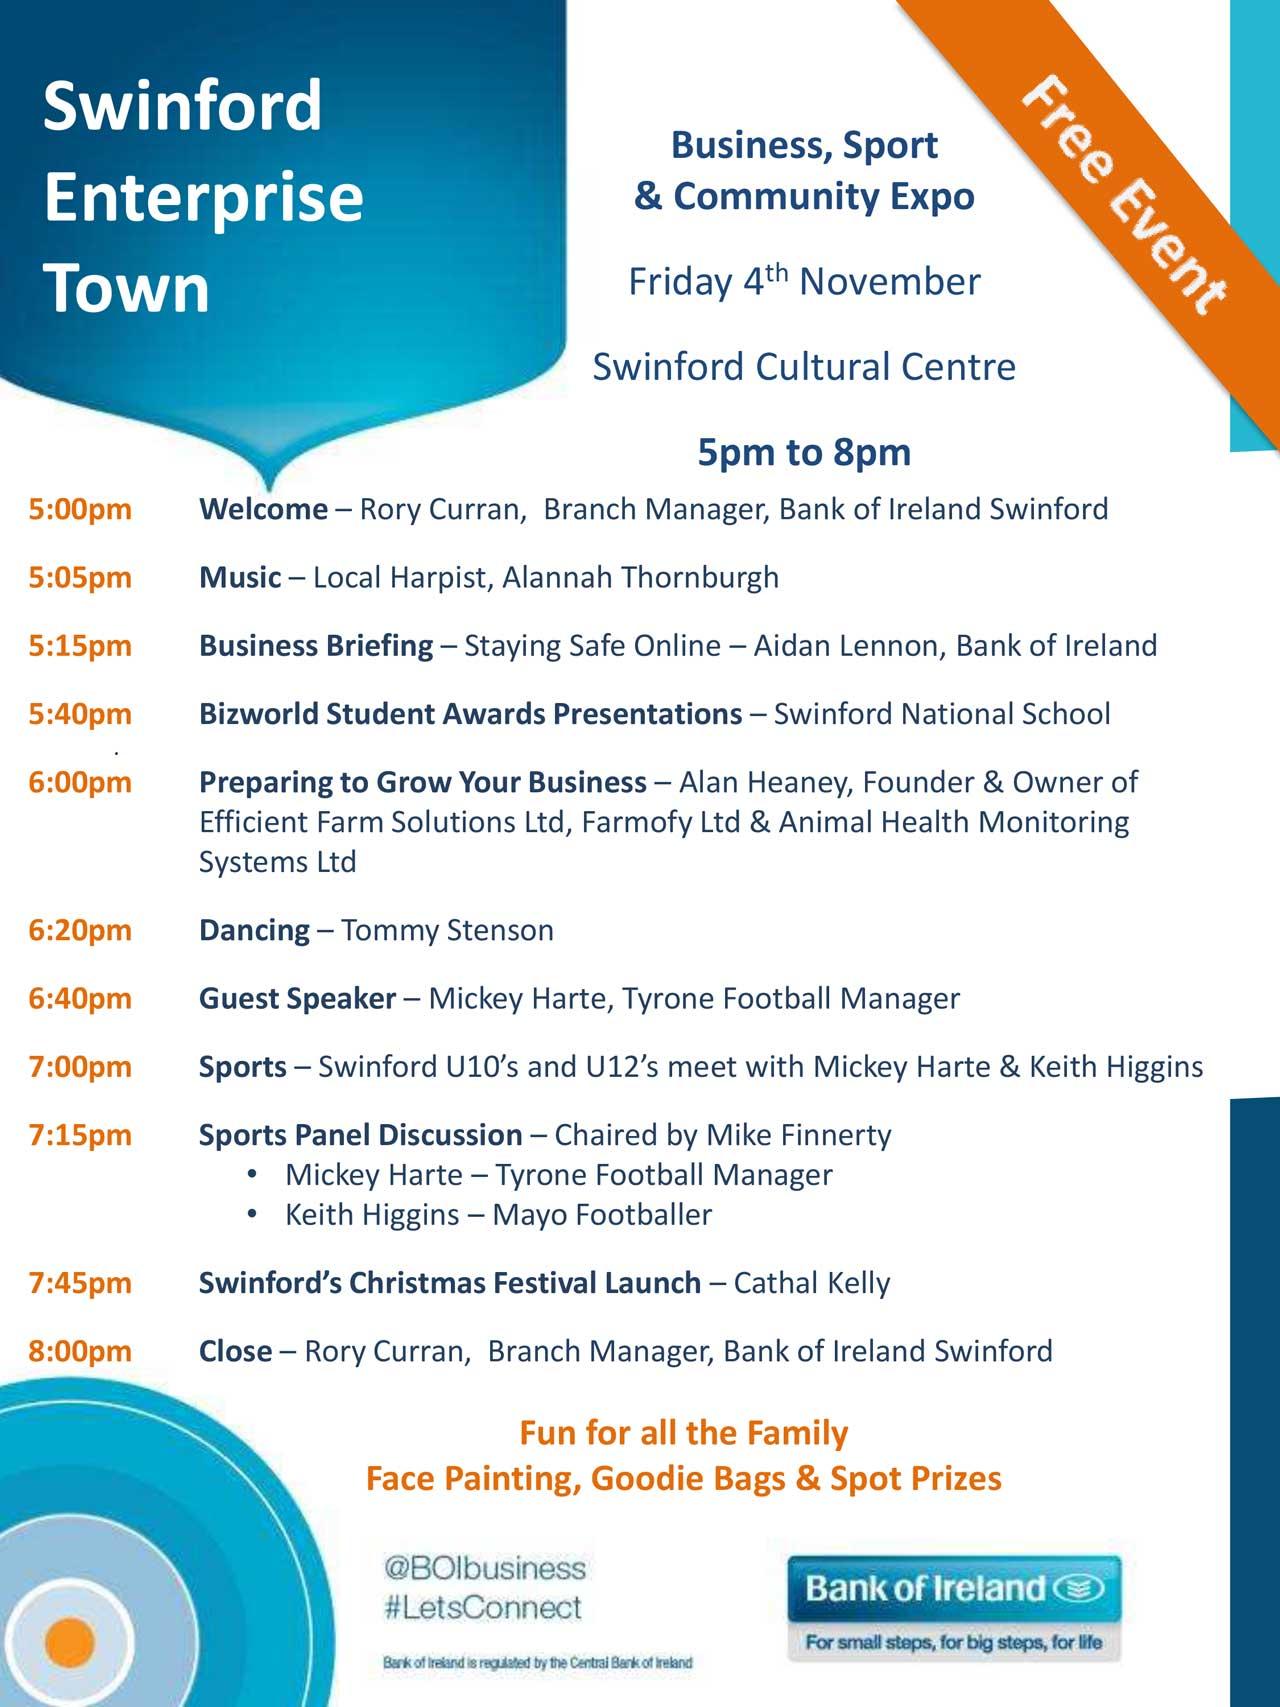 bank-of-ireland-enterprise-event-swinford